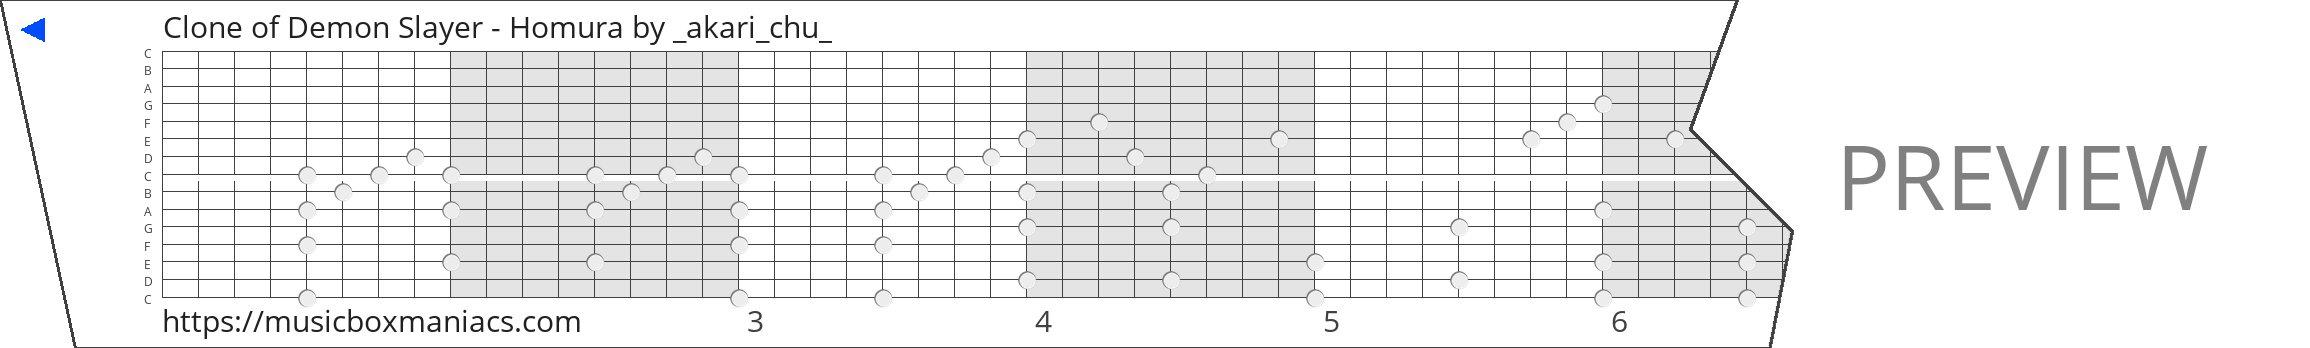 Clone of Demon Slayer - Homura 15 note music box paper strip